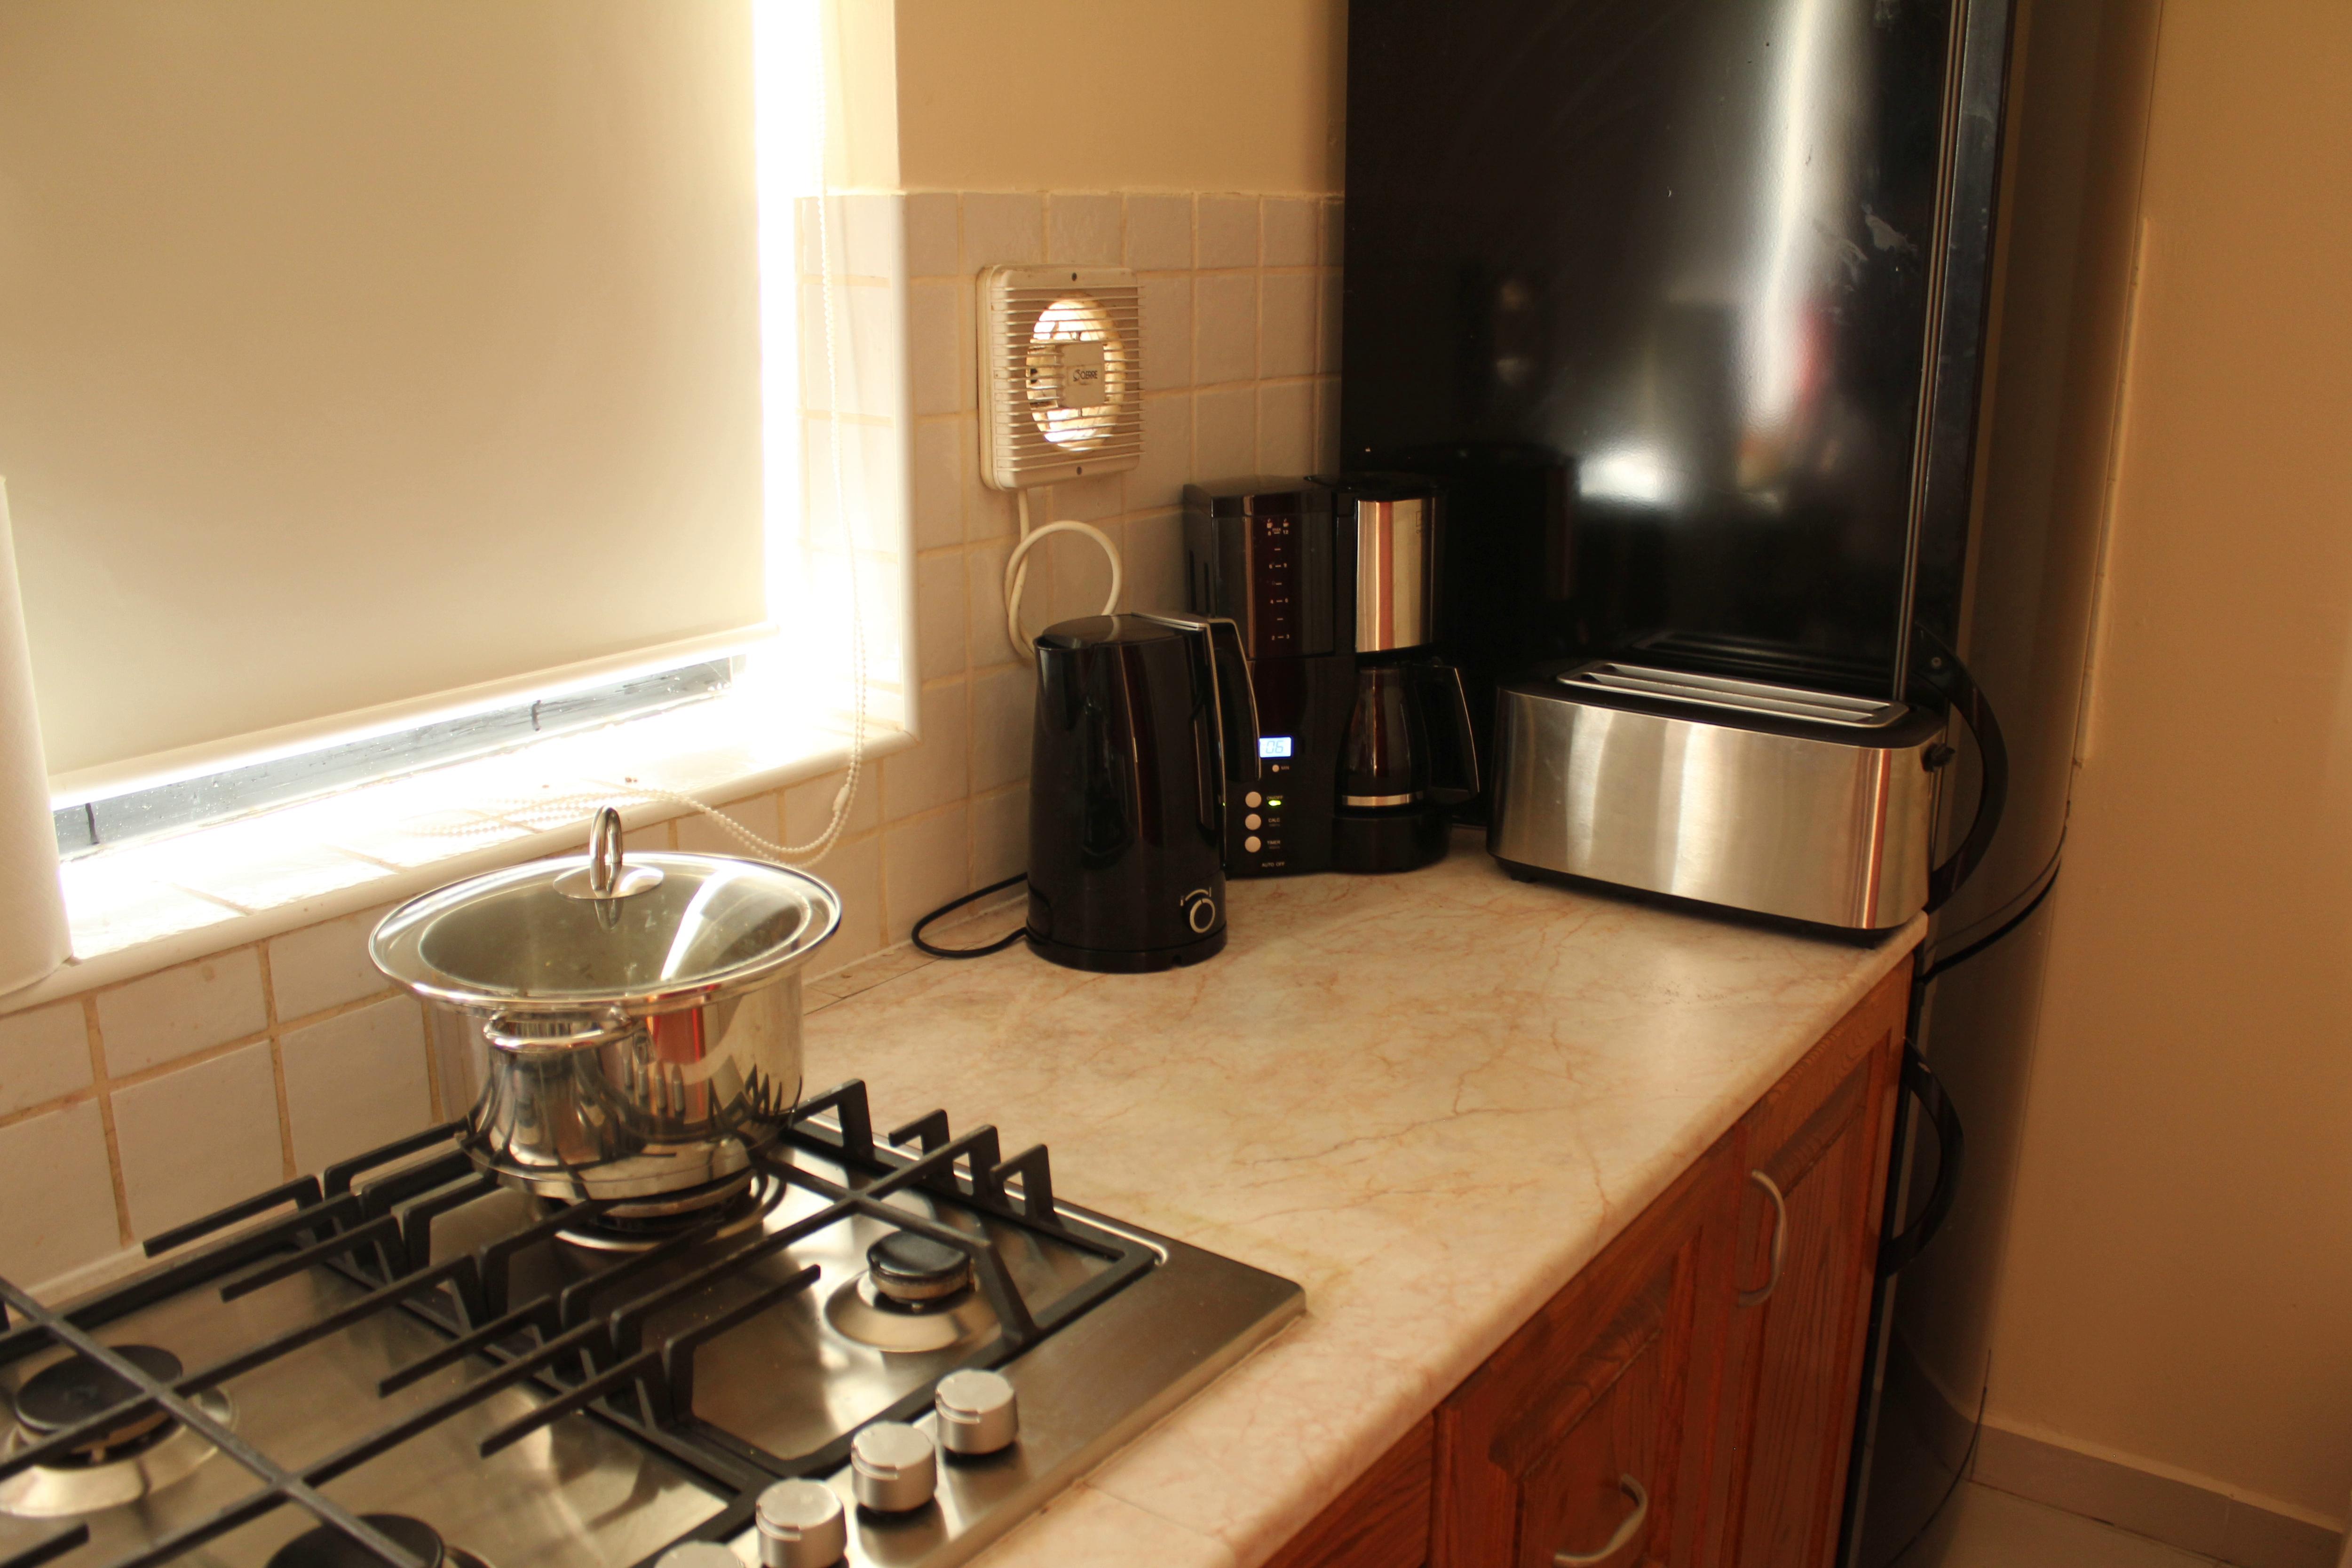 Fotos innen - Apartment Malta